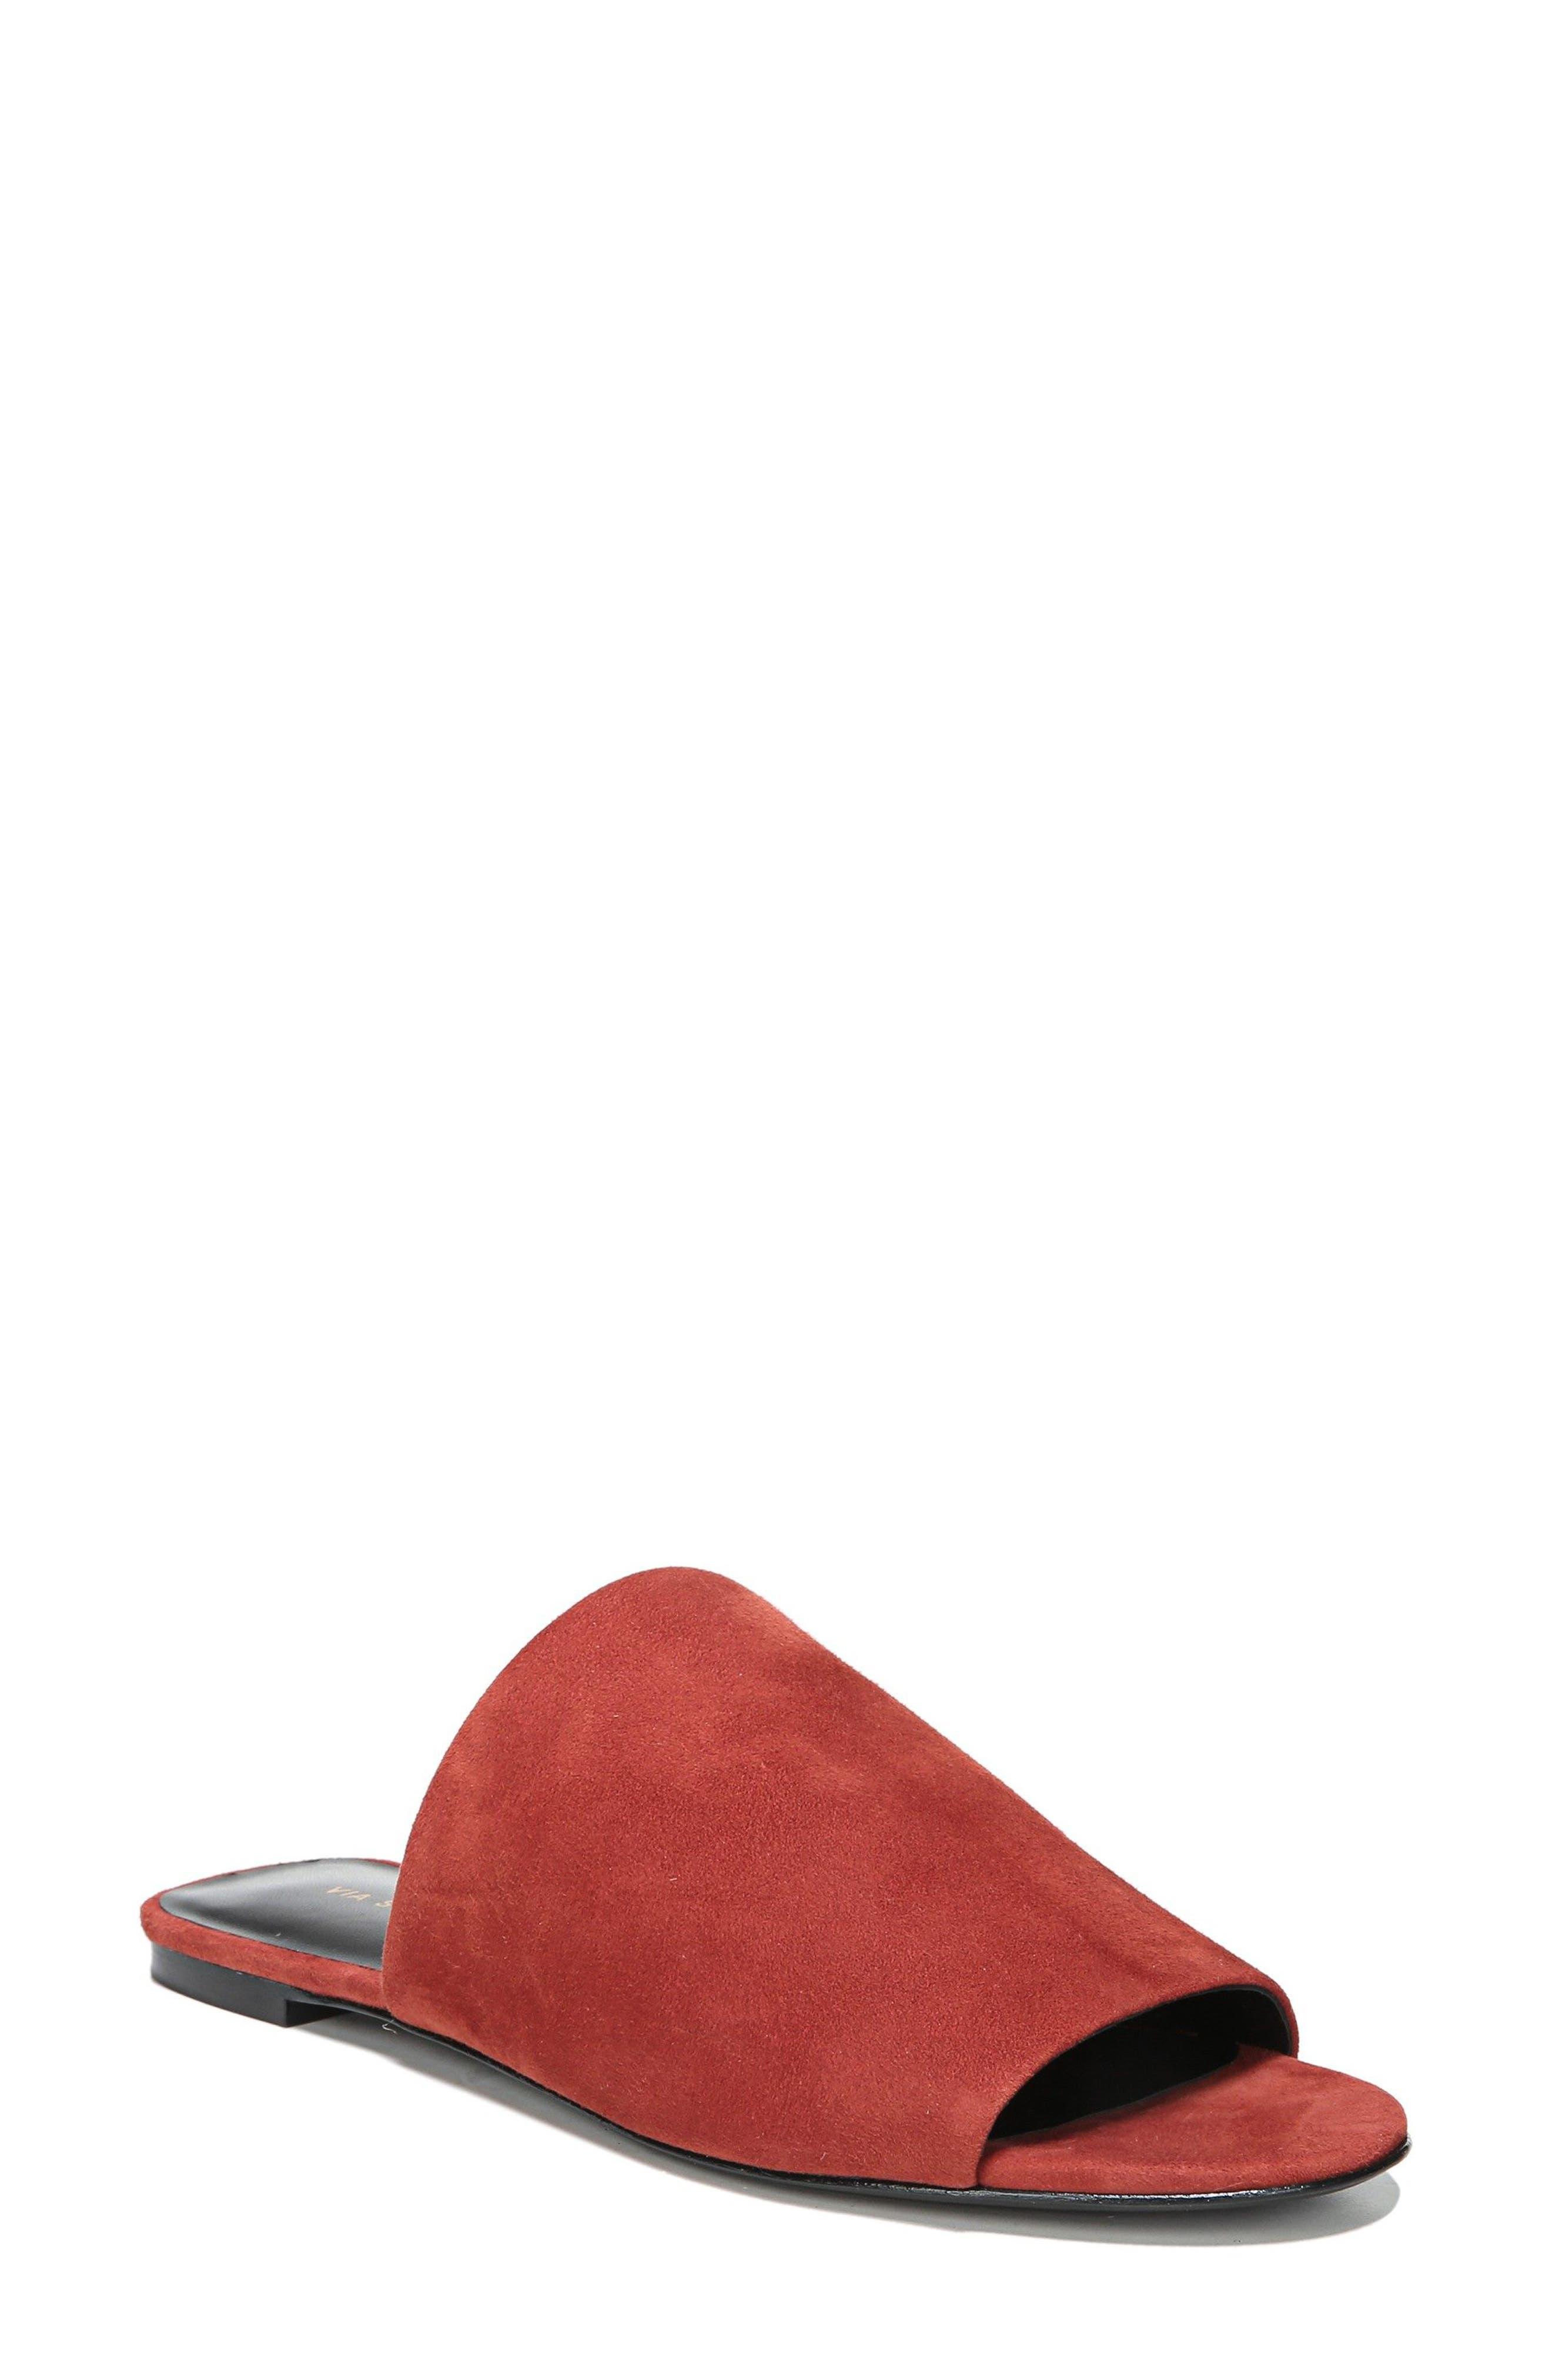 Heather Slide Sandal,                             Main thumbnail 1, color,                             Brick Leather